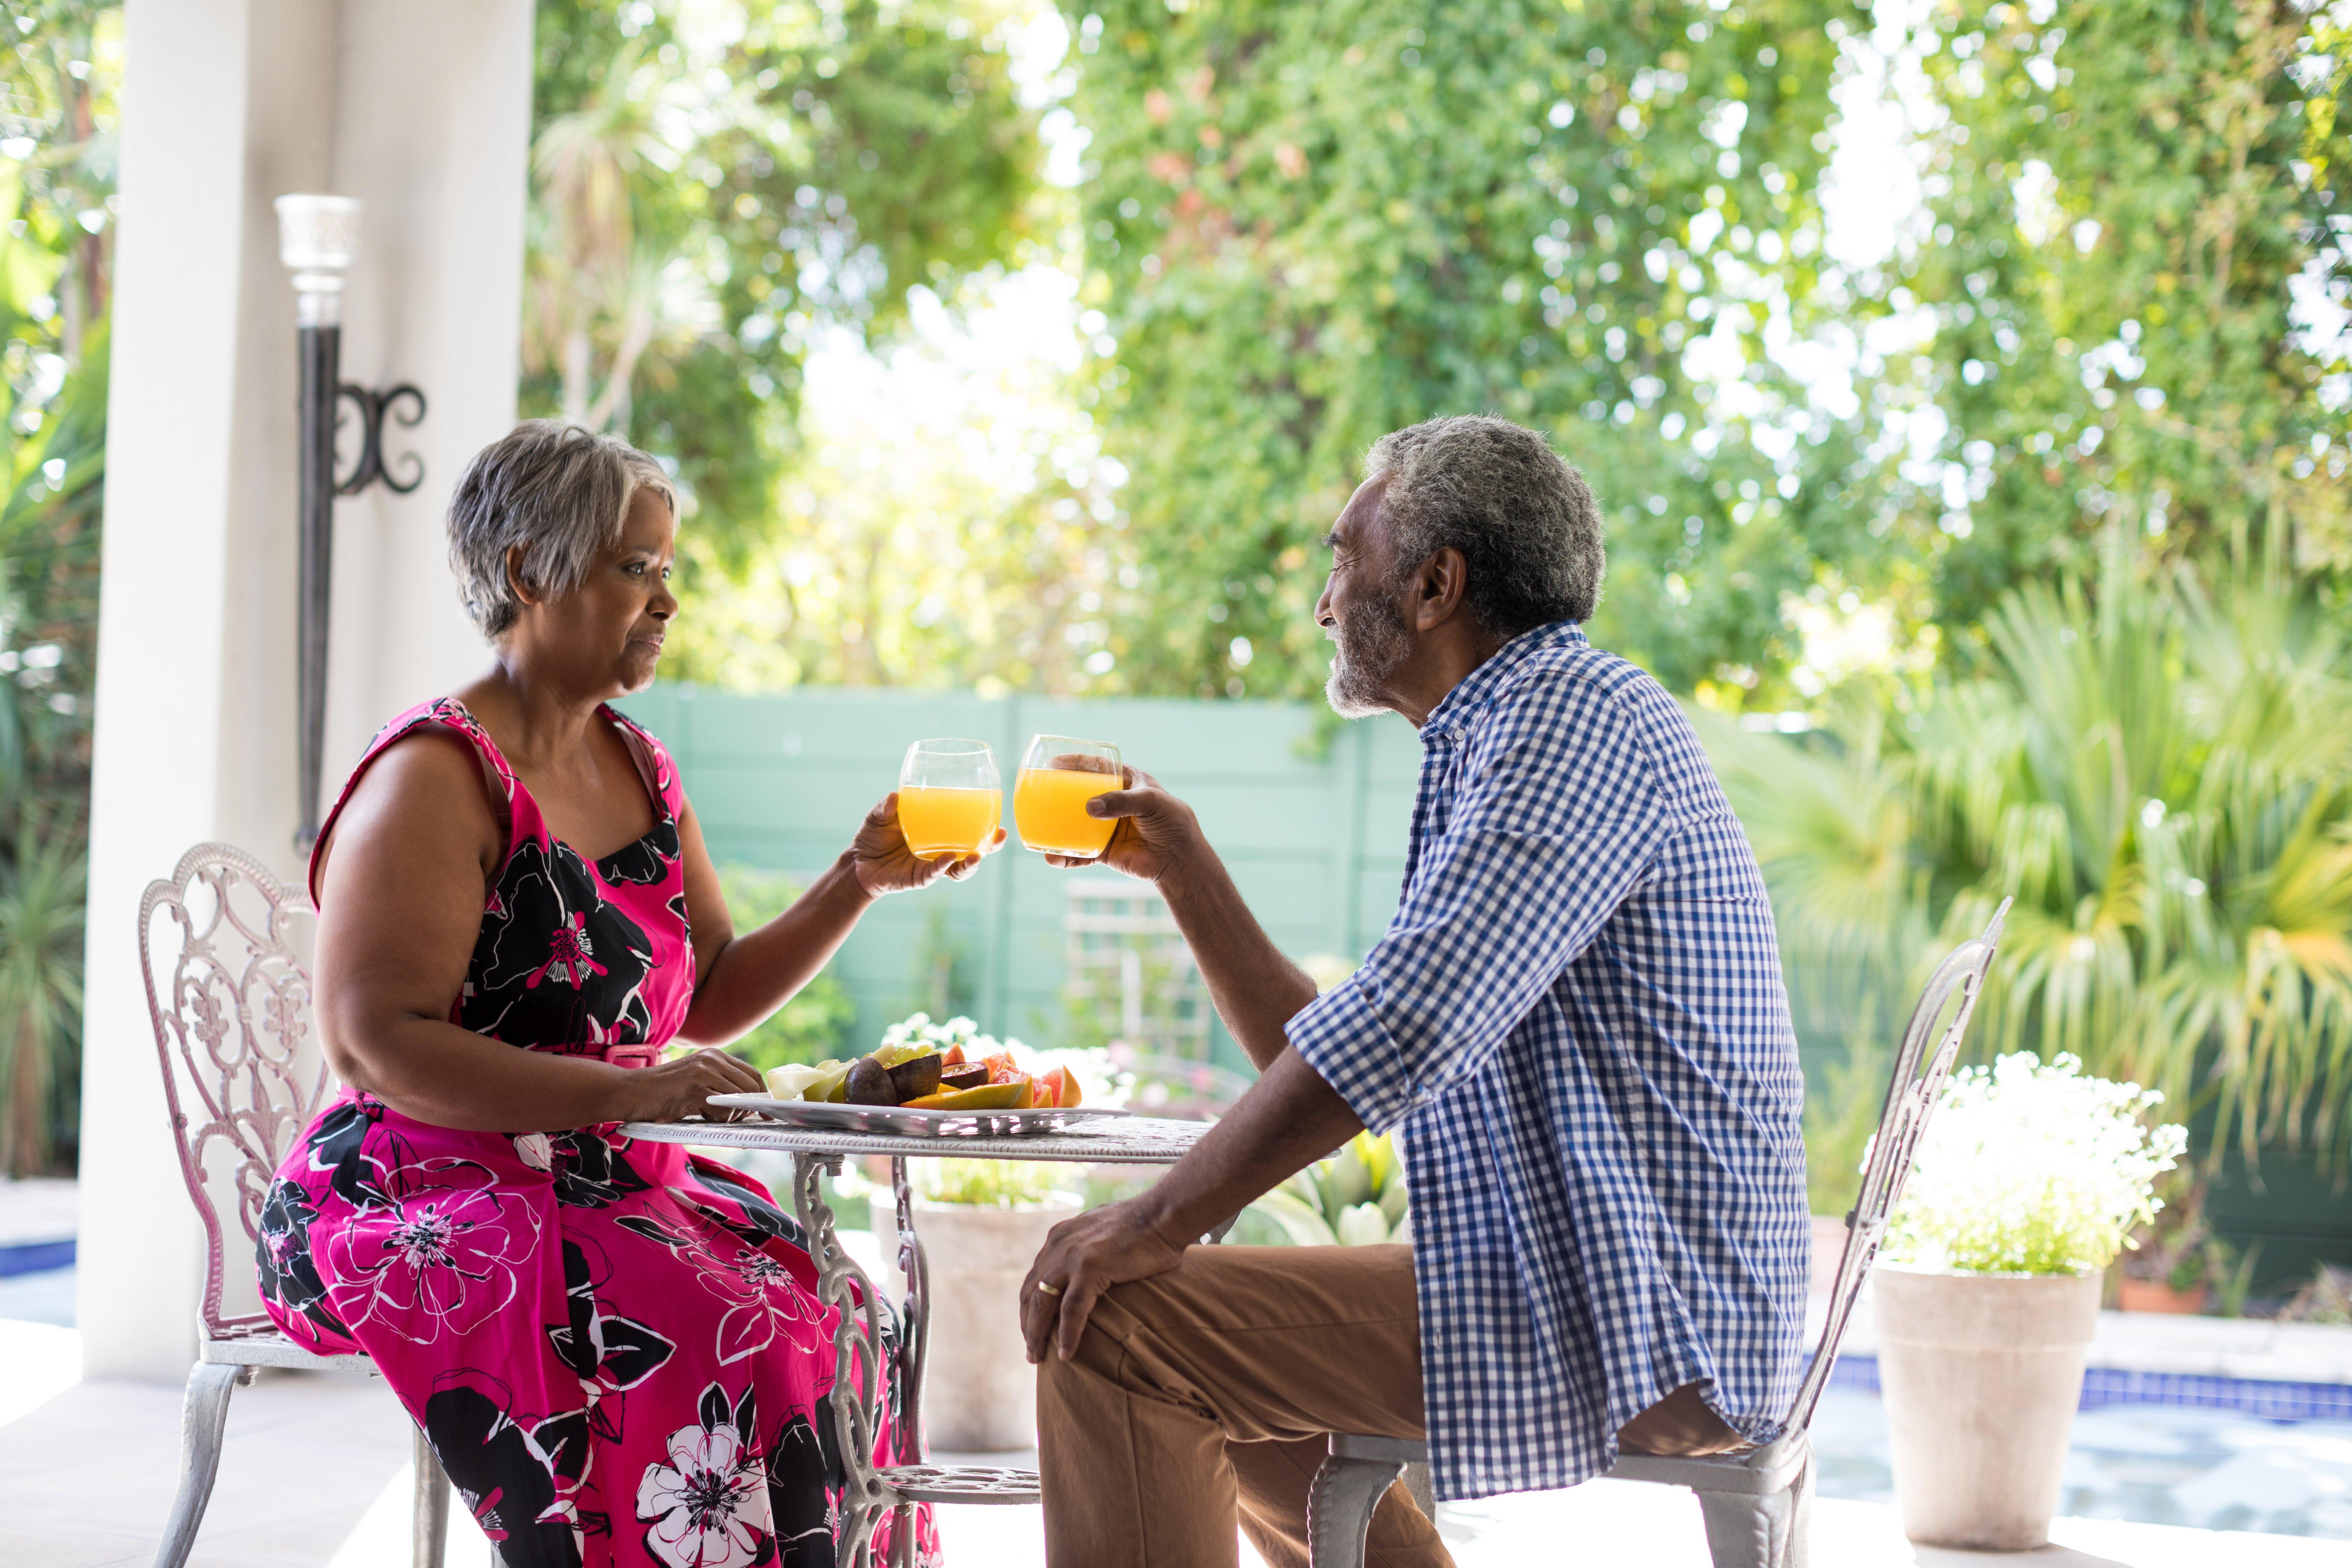 senior-couple-toasting-drinking-glasses-LTCQEK4